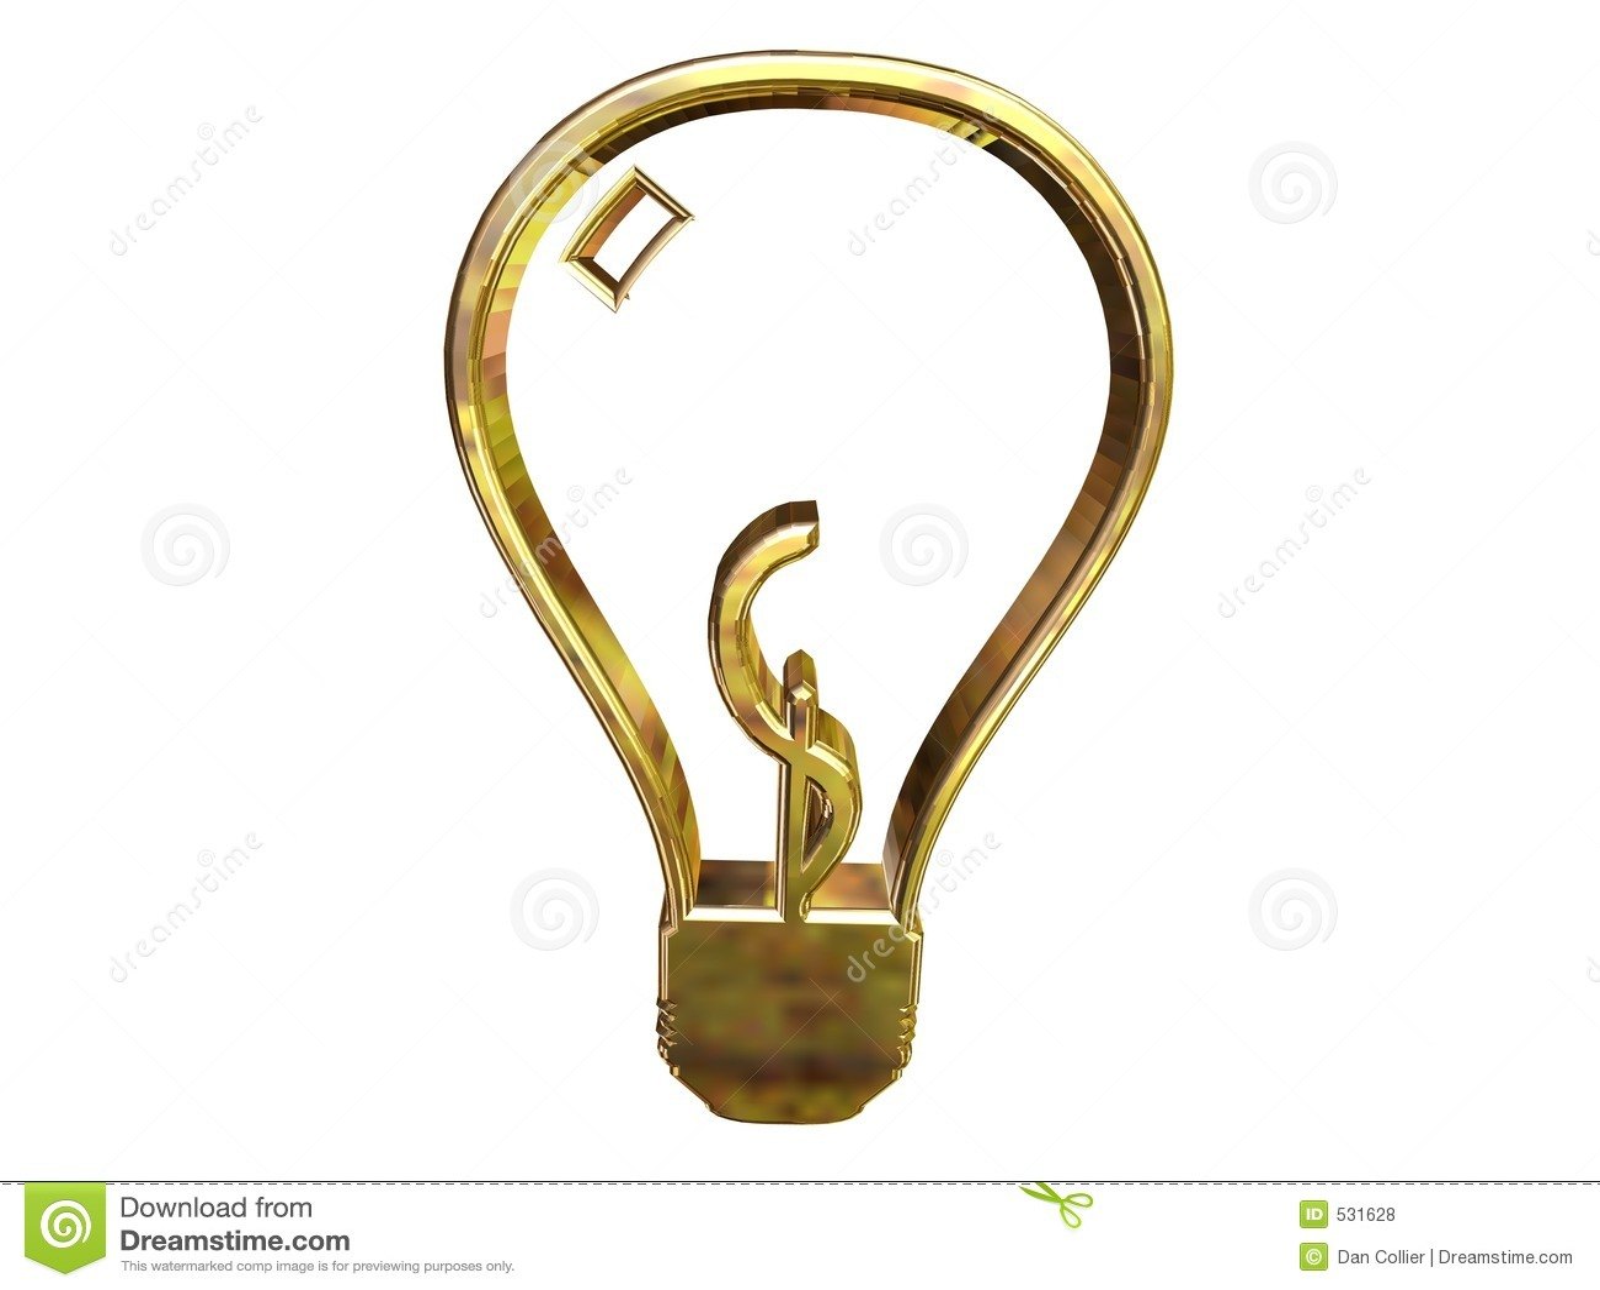 Download 轻的符号 库存例证. 插画 包括有 照亮, 头脑, 概念, 聪明, 认为, 例证, bulfinch, 球状 - 531628